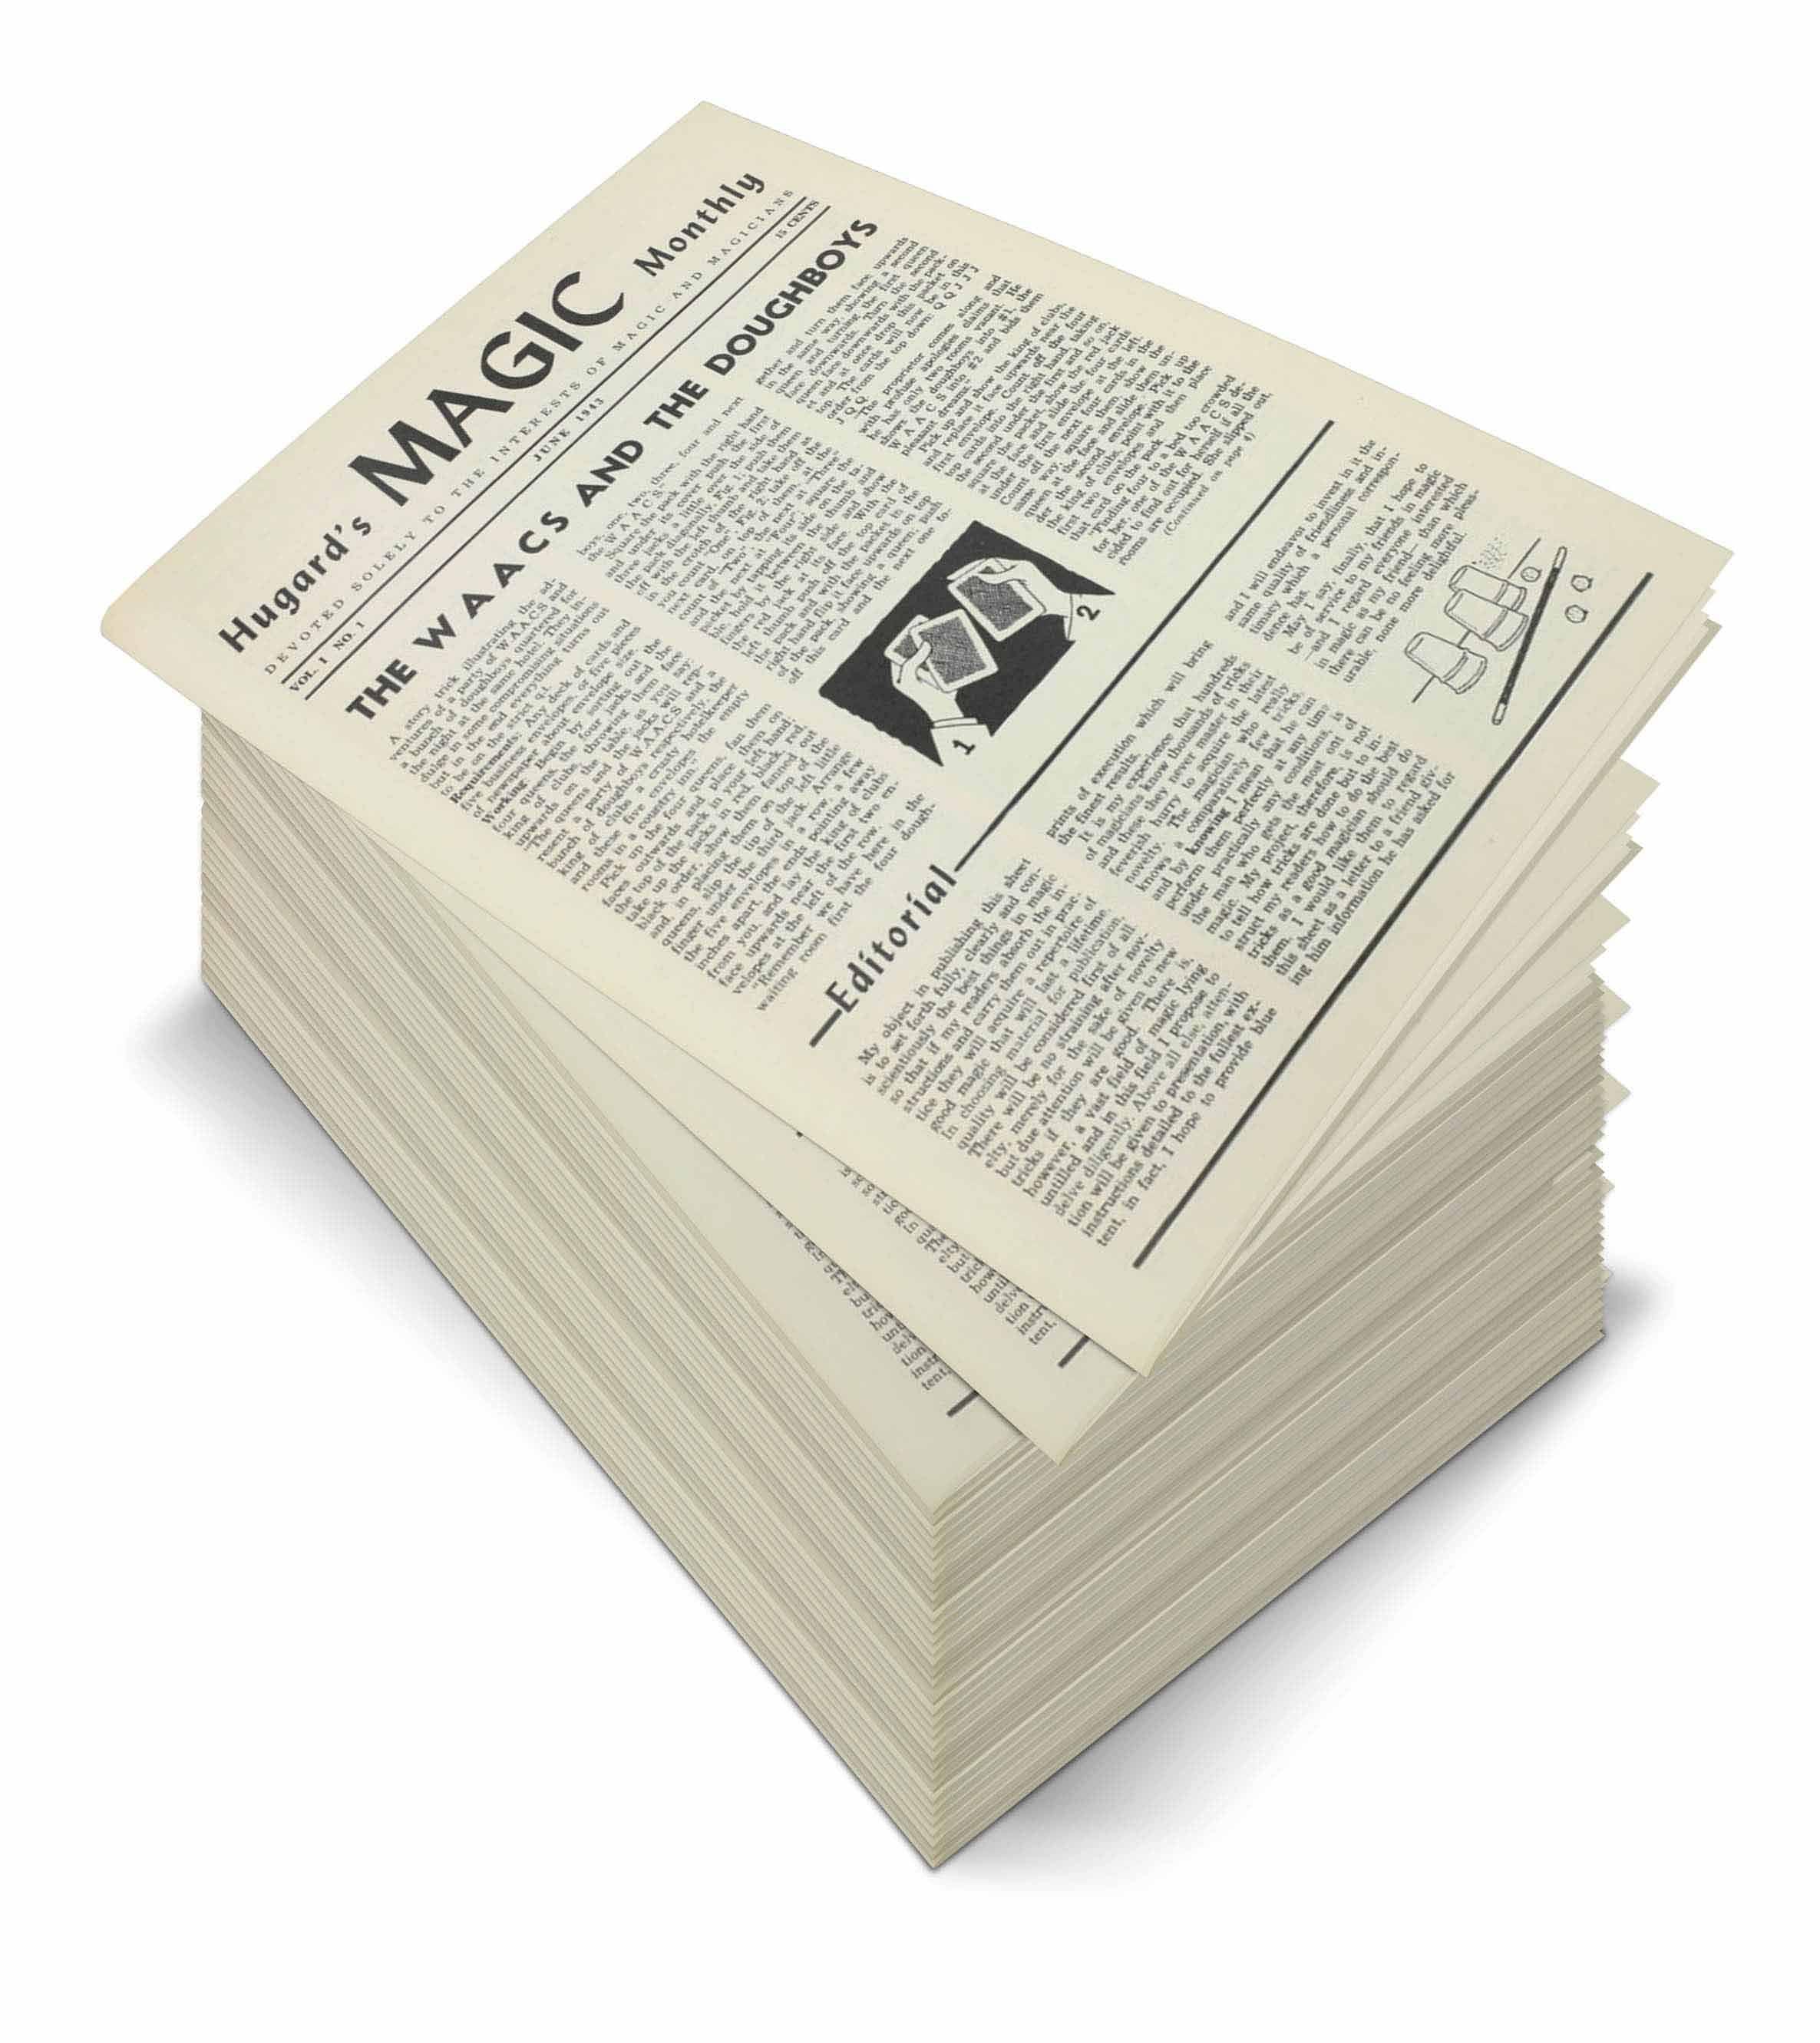 Hugard's Magic Monthly Complete File - magic